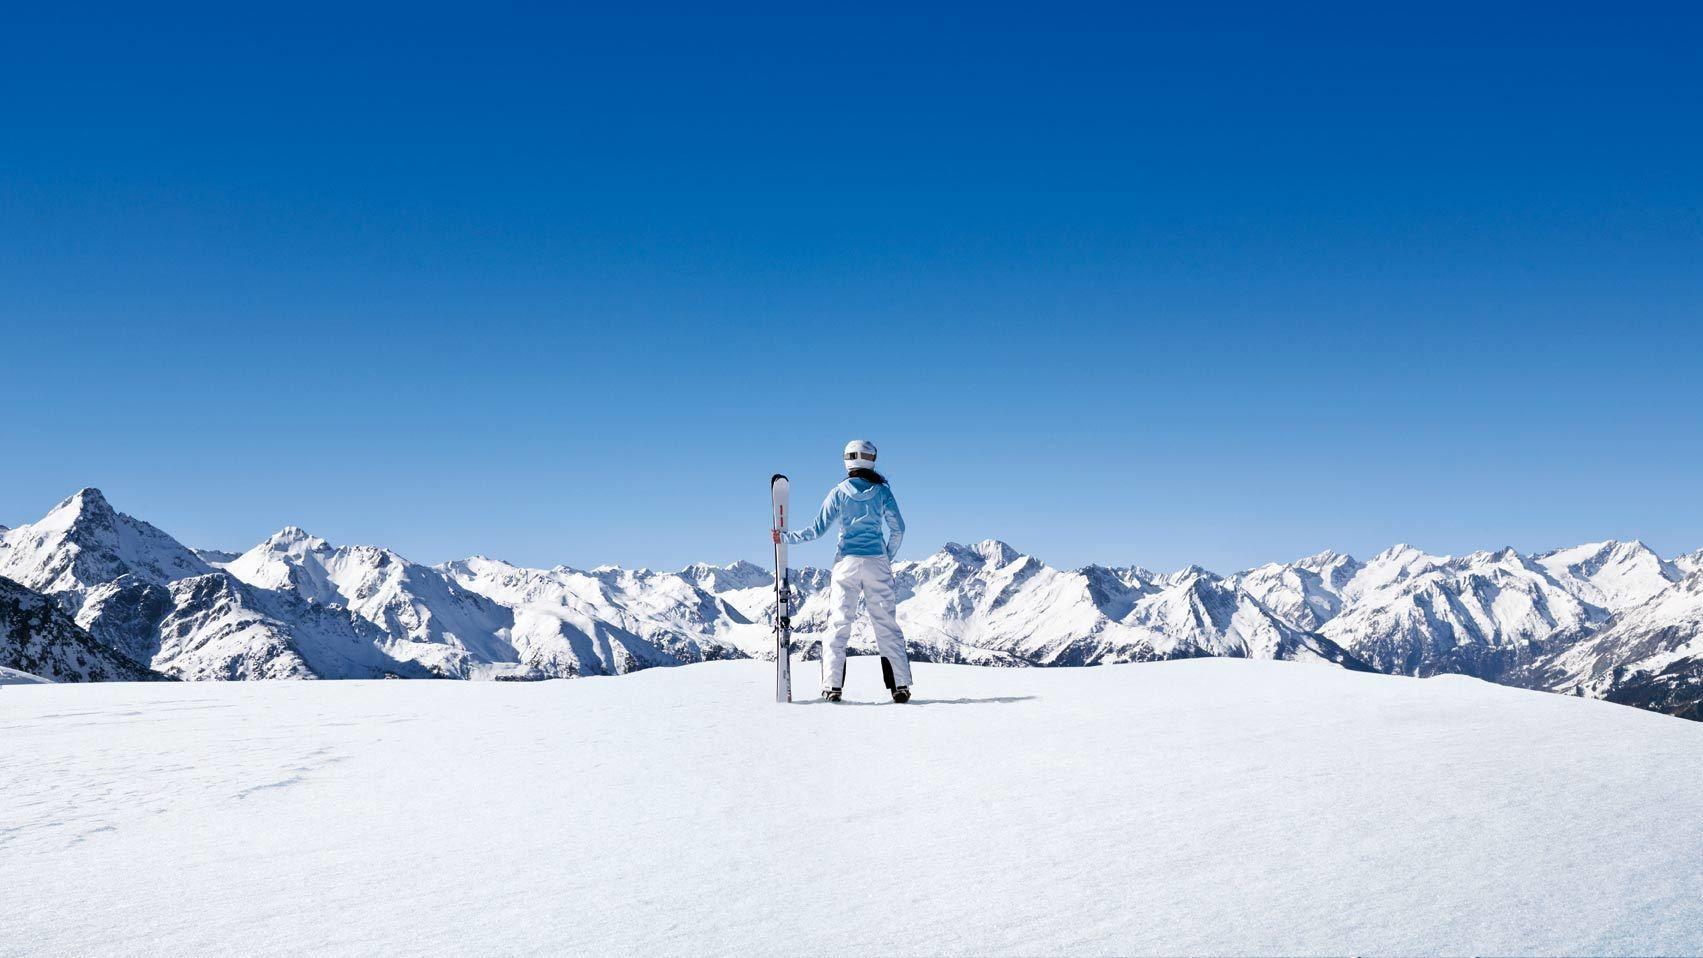 Skier standing on the snow in Munich